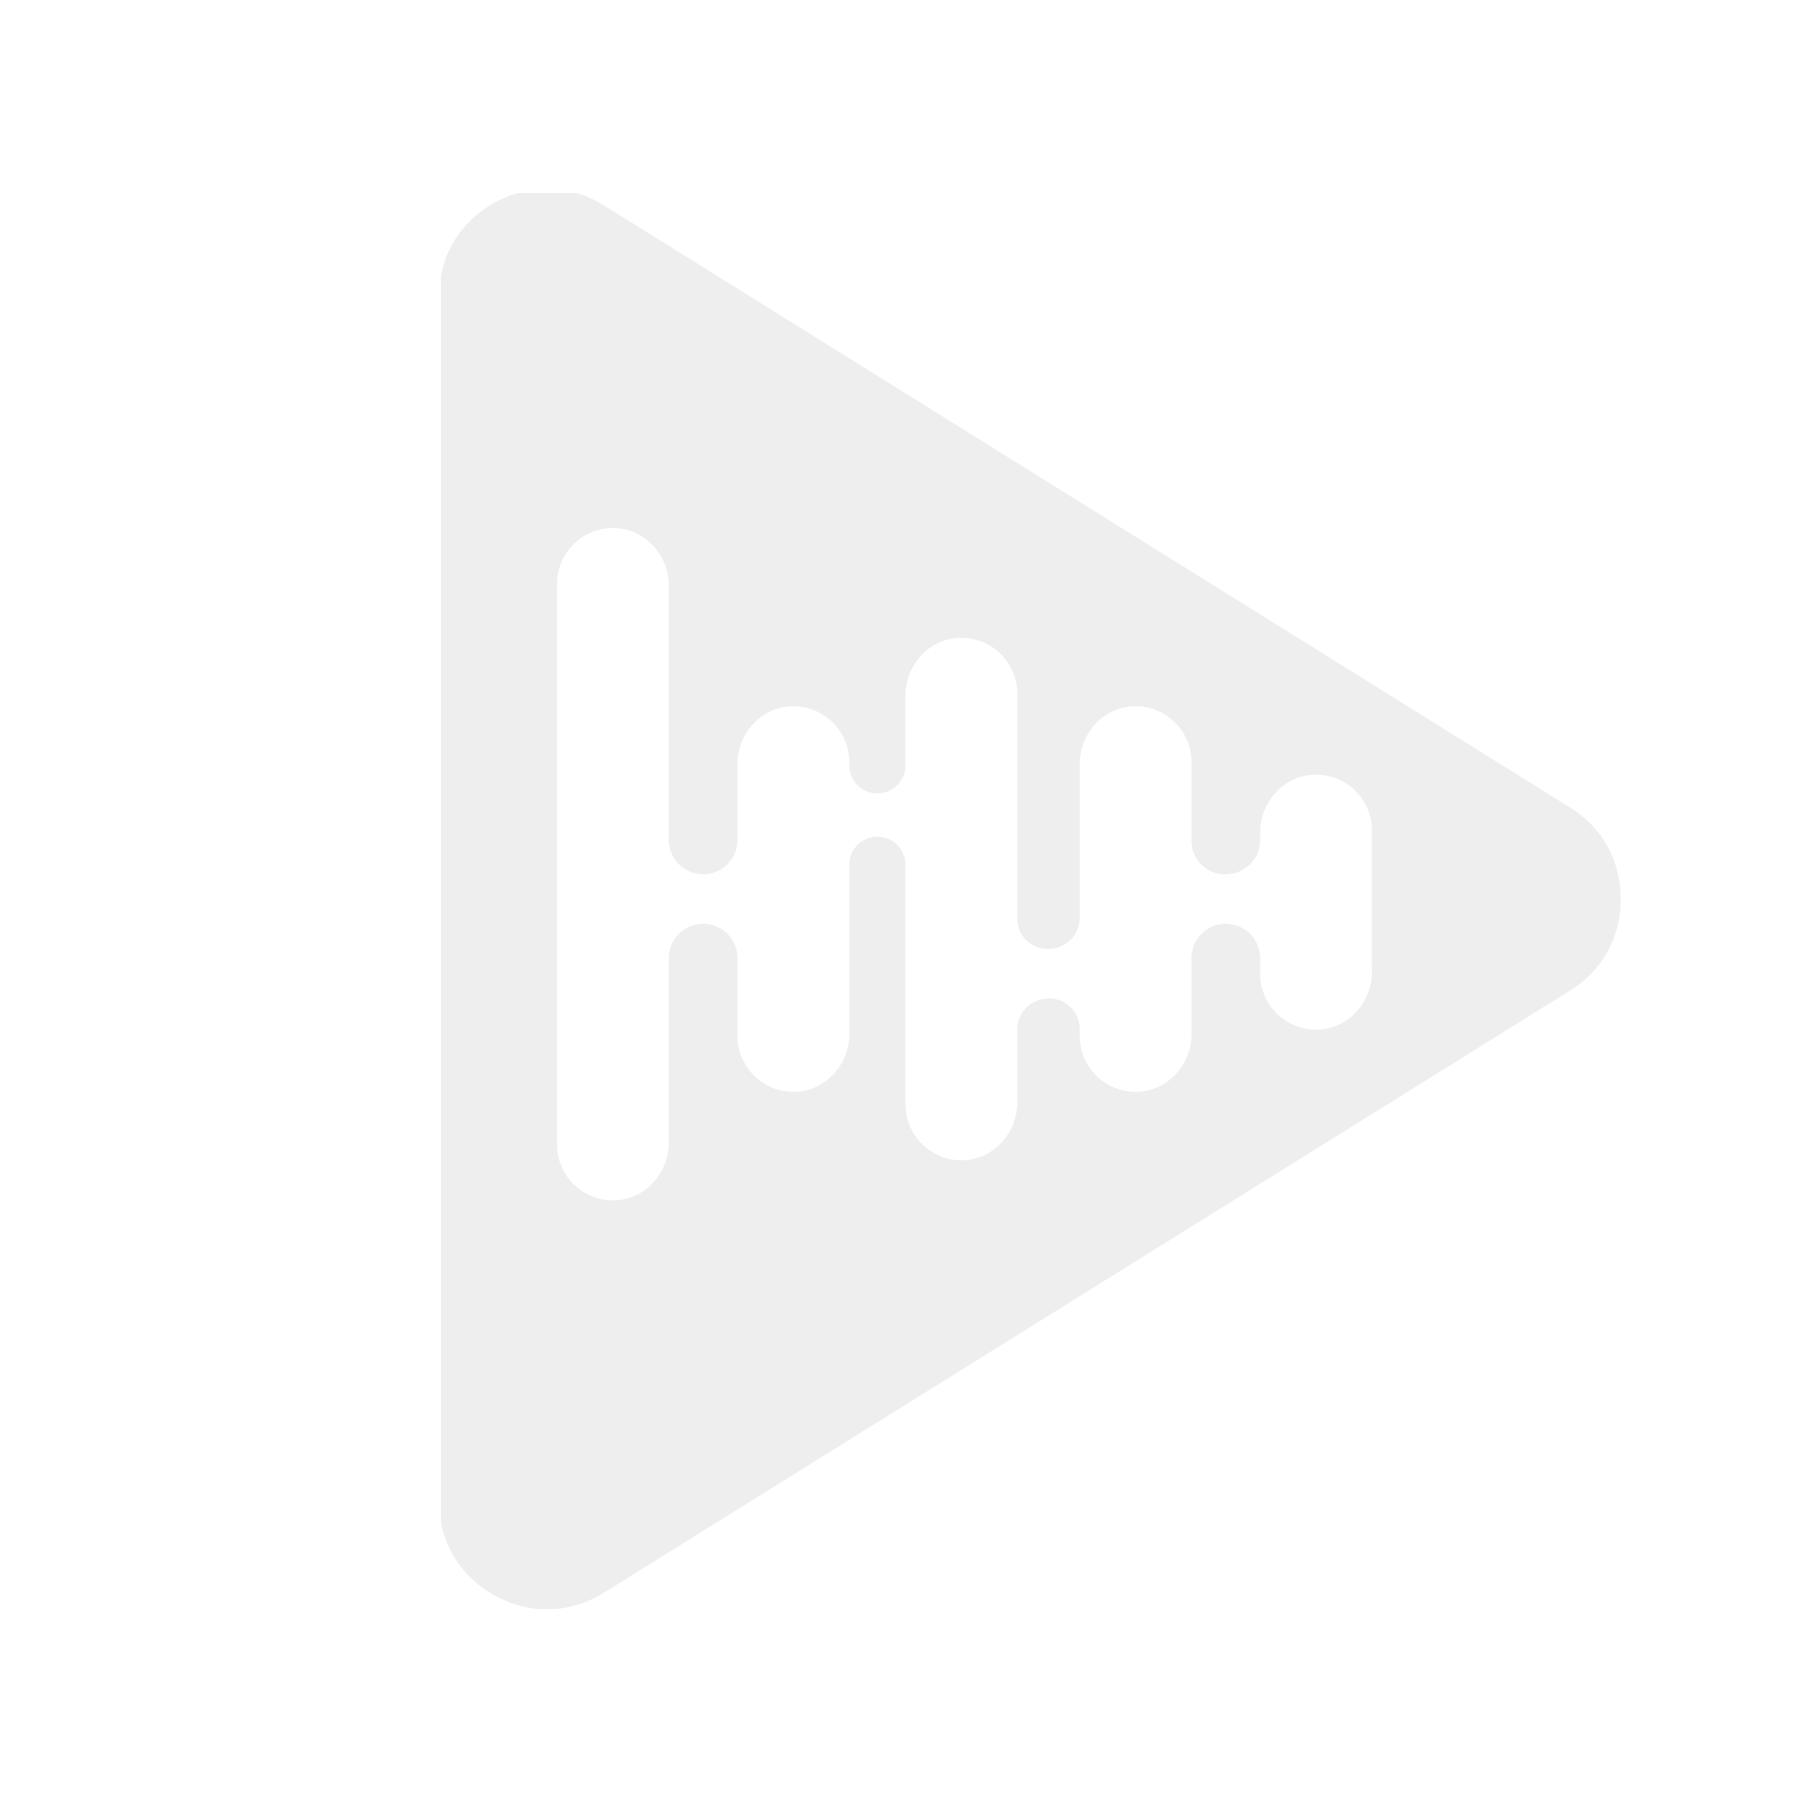 Speedsignal C-3414101